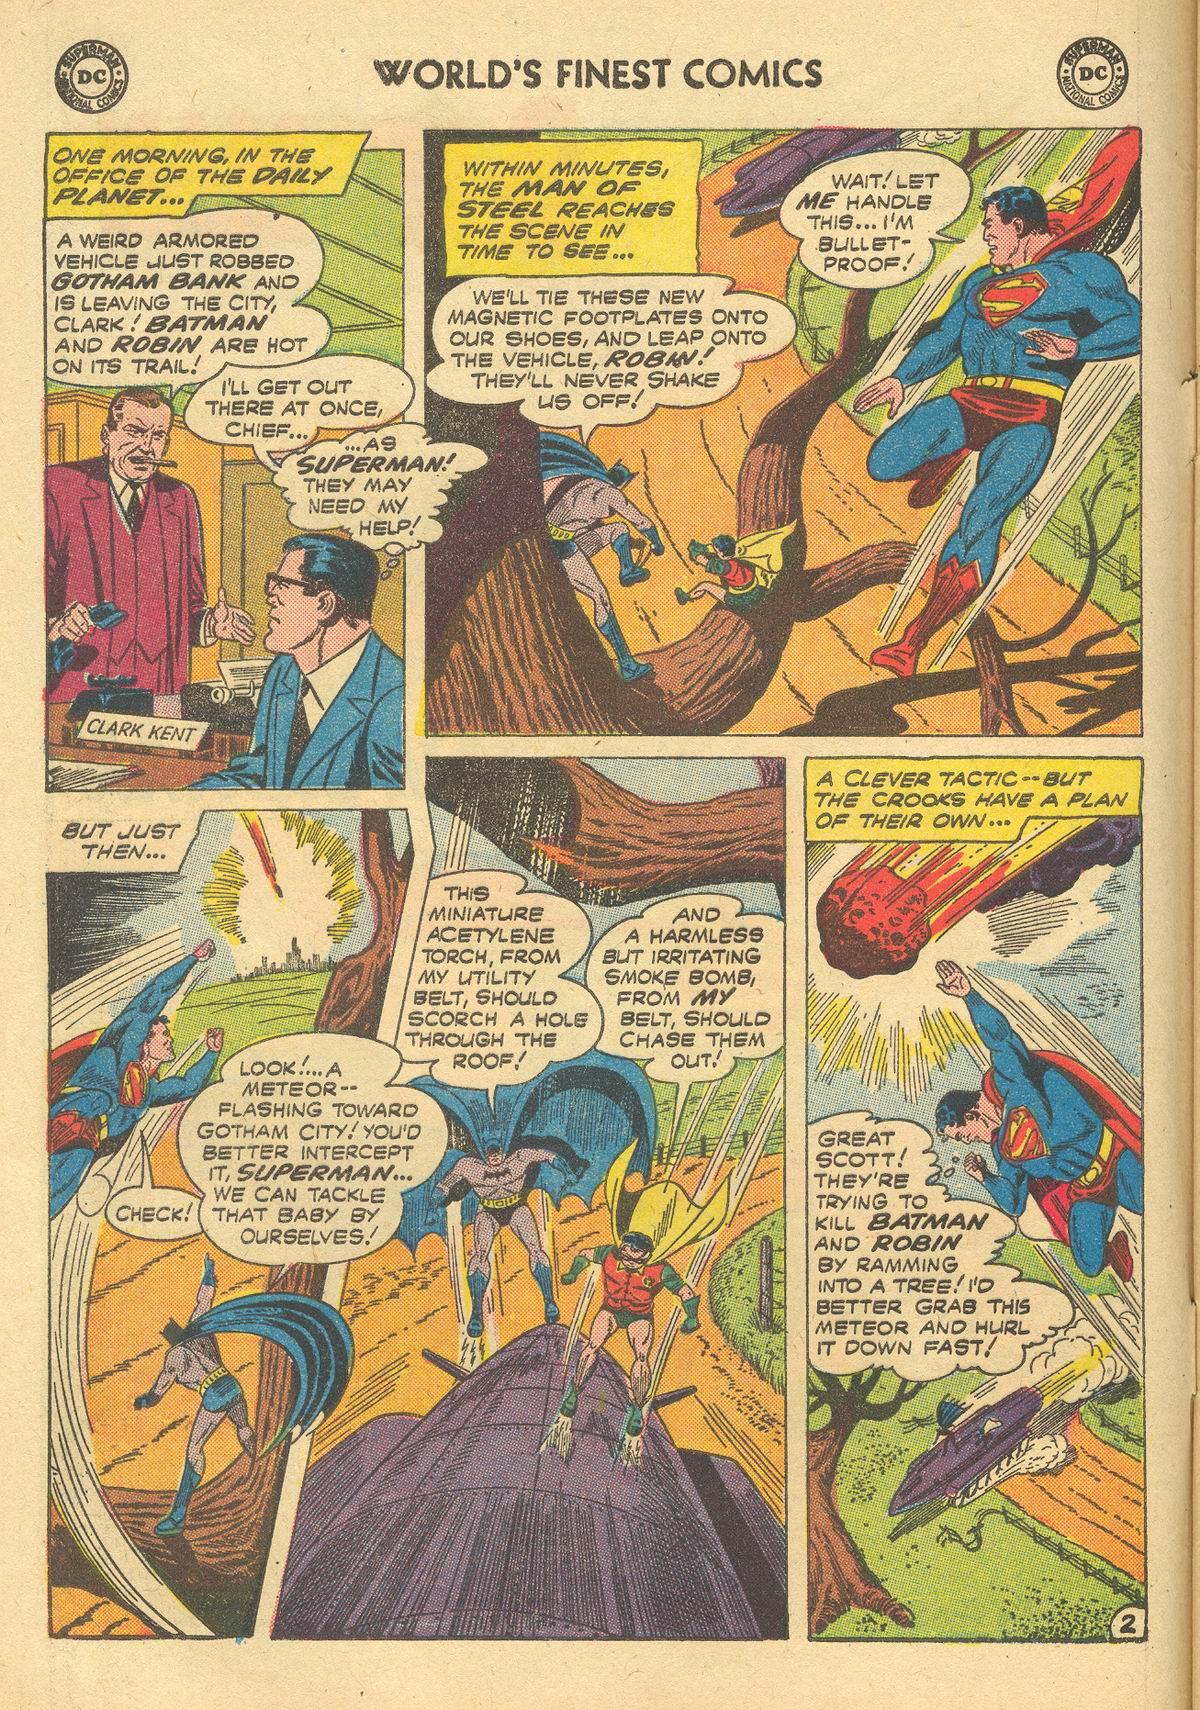 Read online World's Finest Comics comic -  Issue #105 - 4